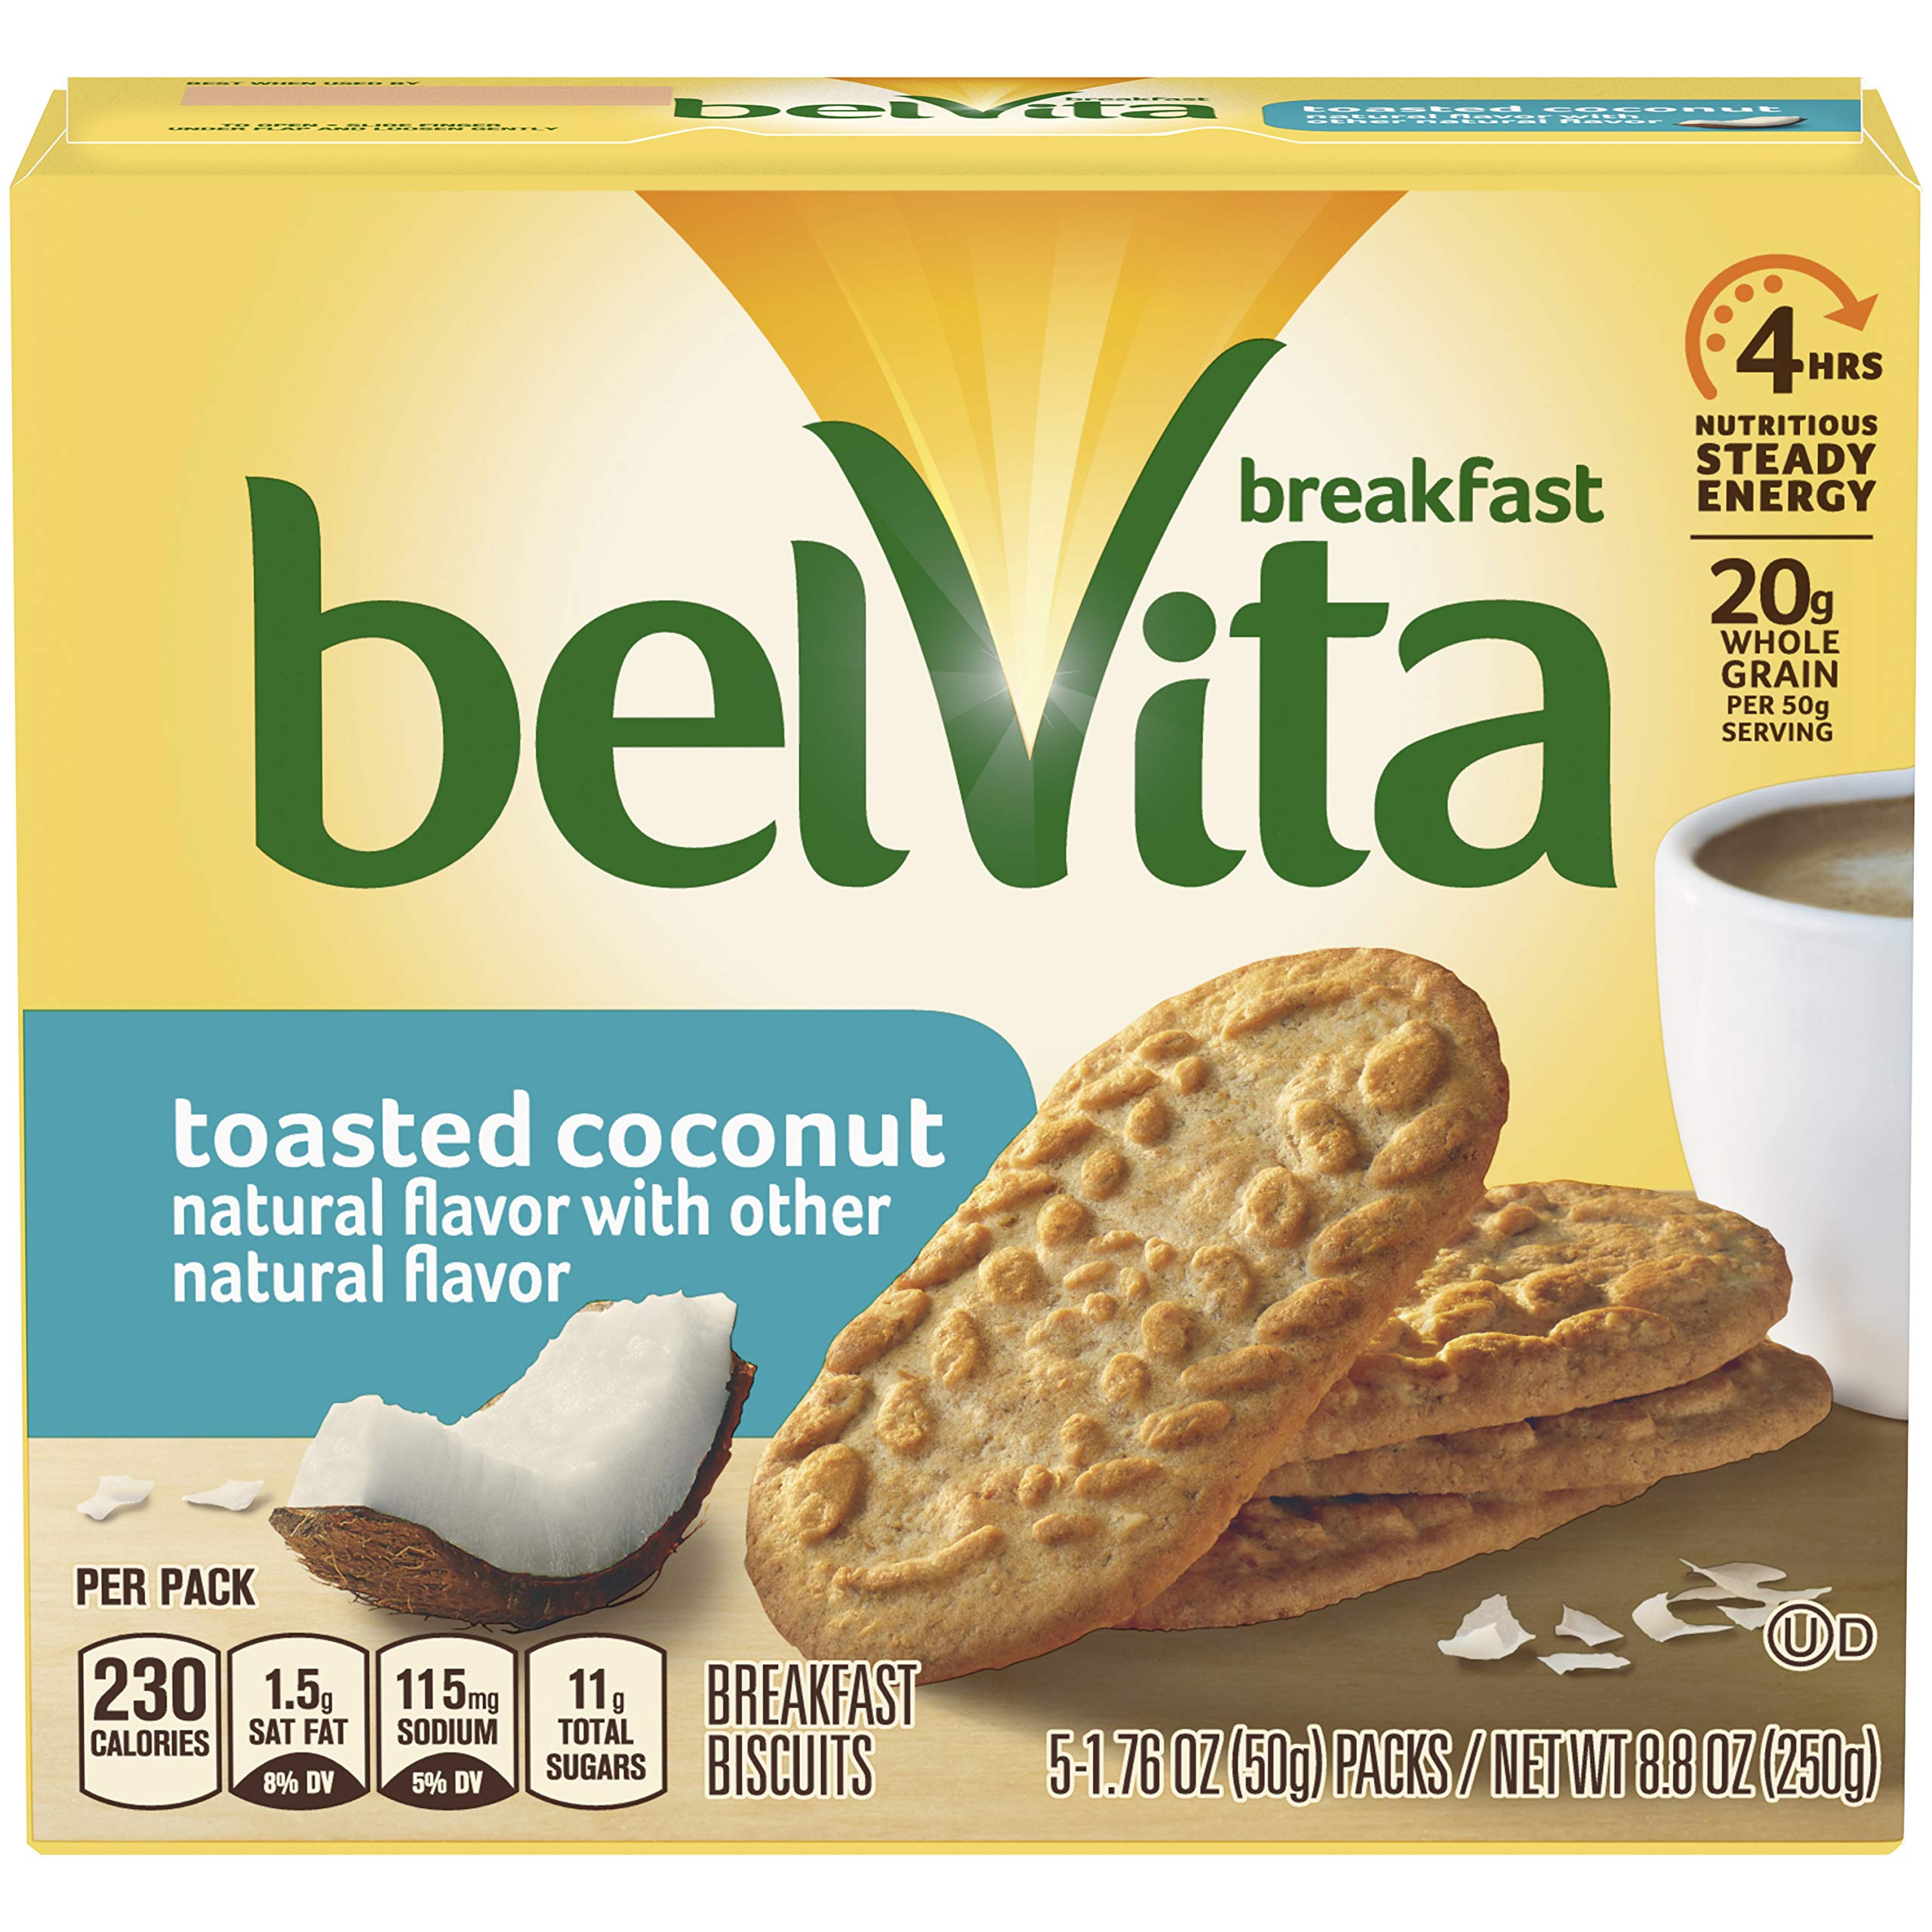 belVita Breakfast Biscuits, Toasted Coconut Flavor, 30 Packs (4 Biscuits Per Pack) by Belvita